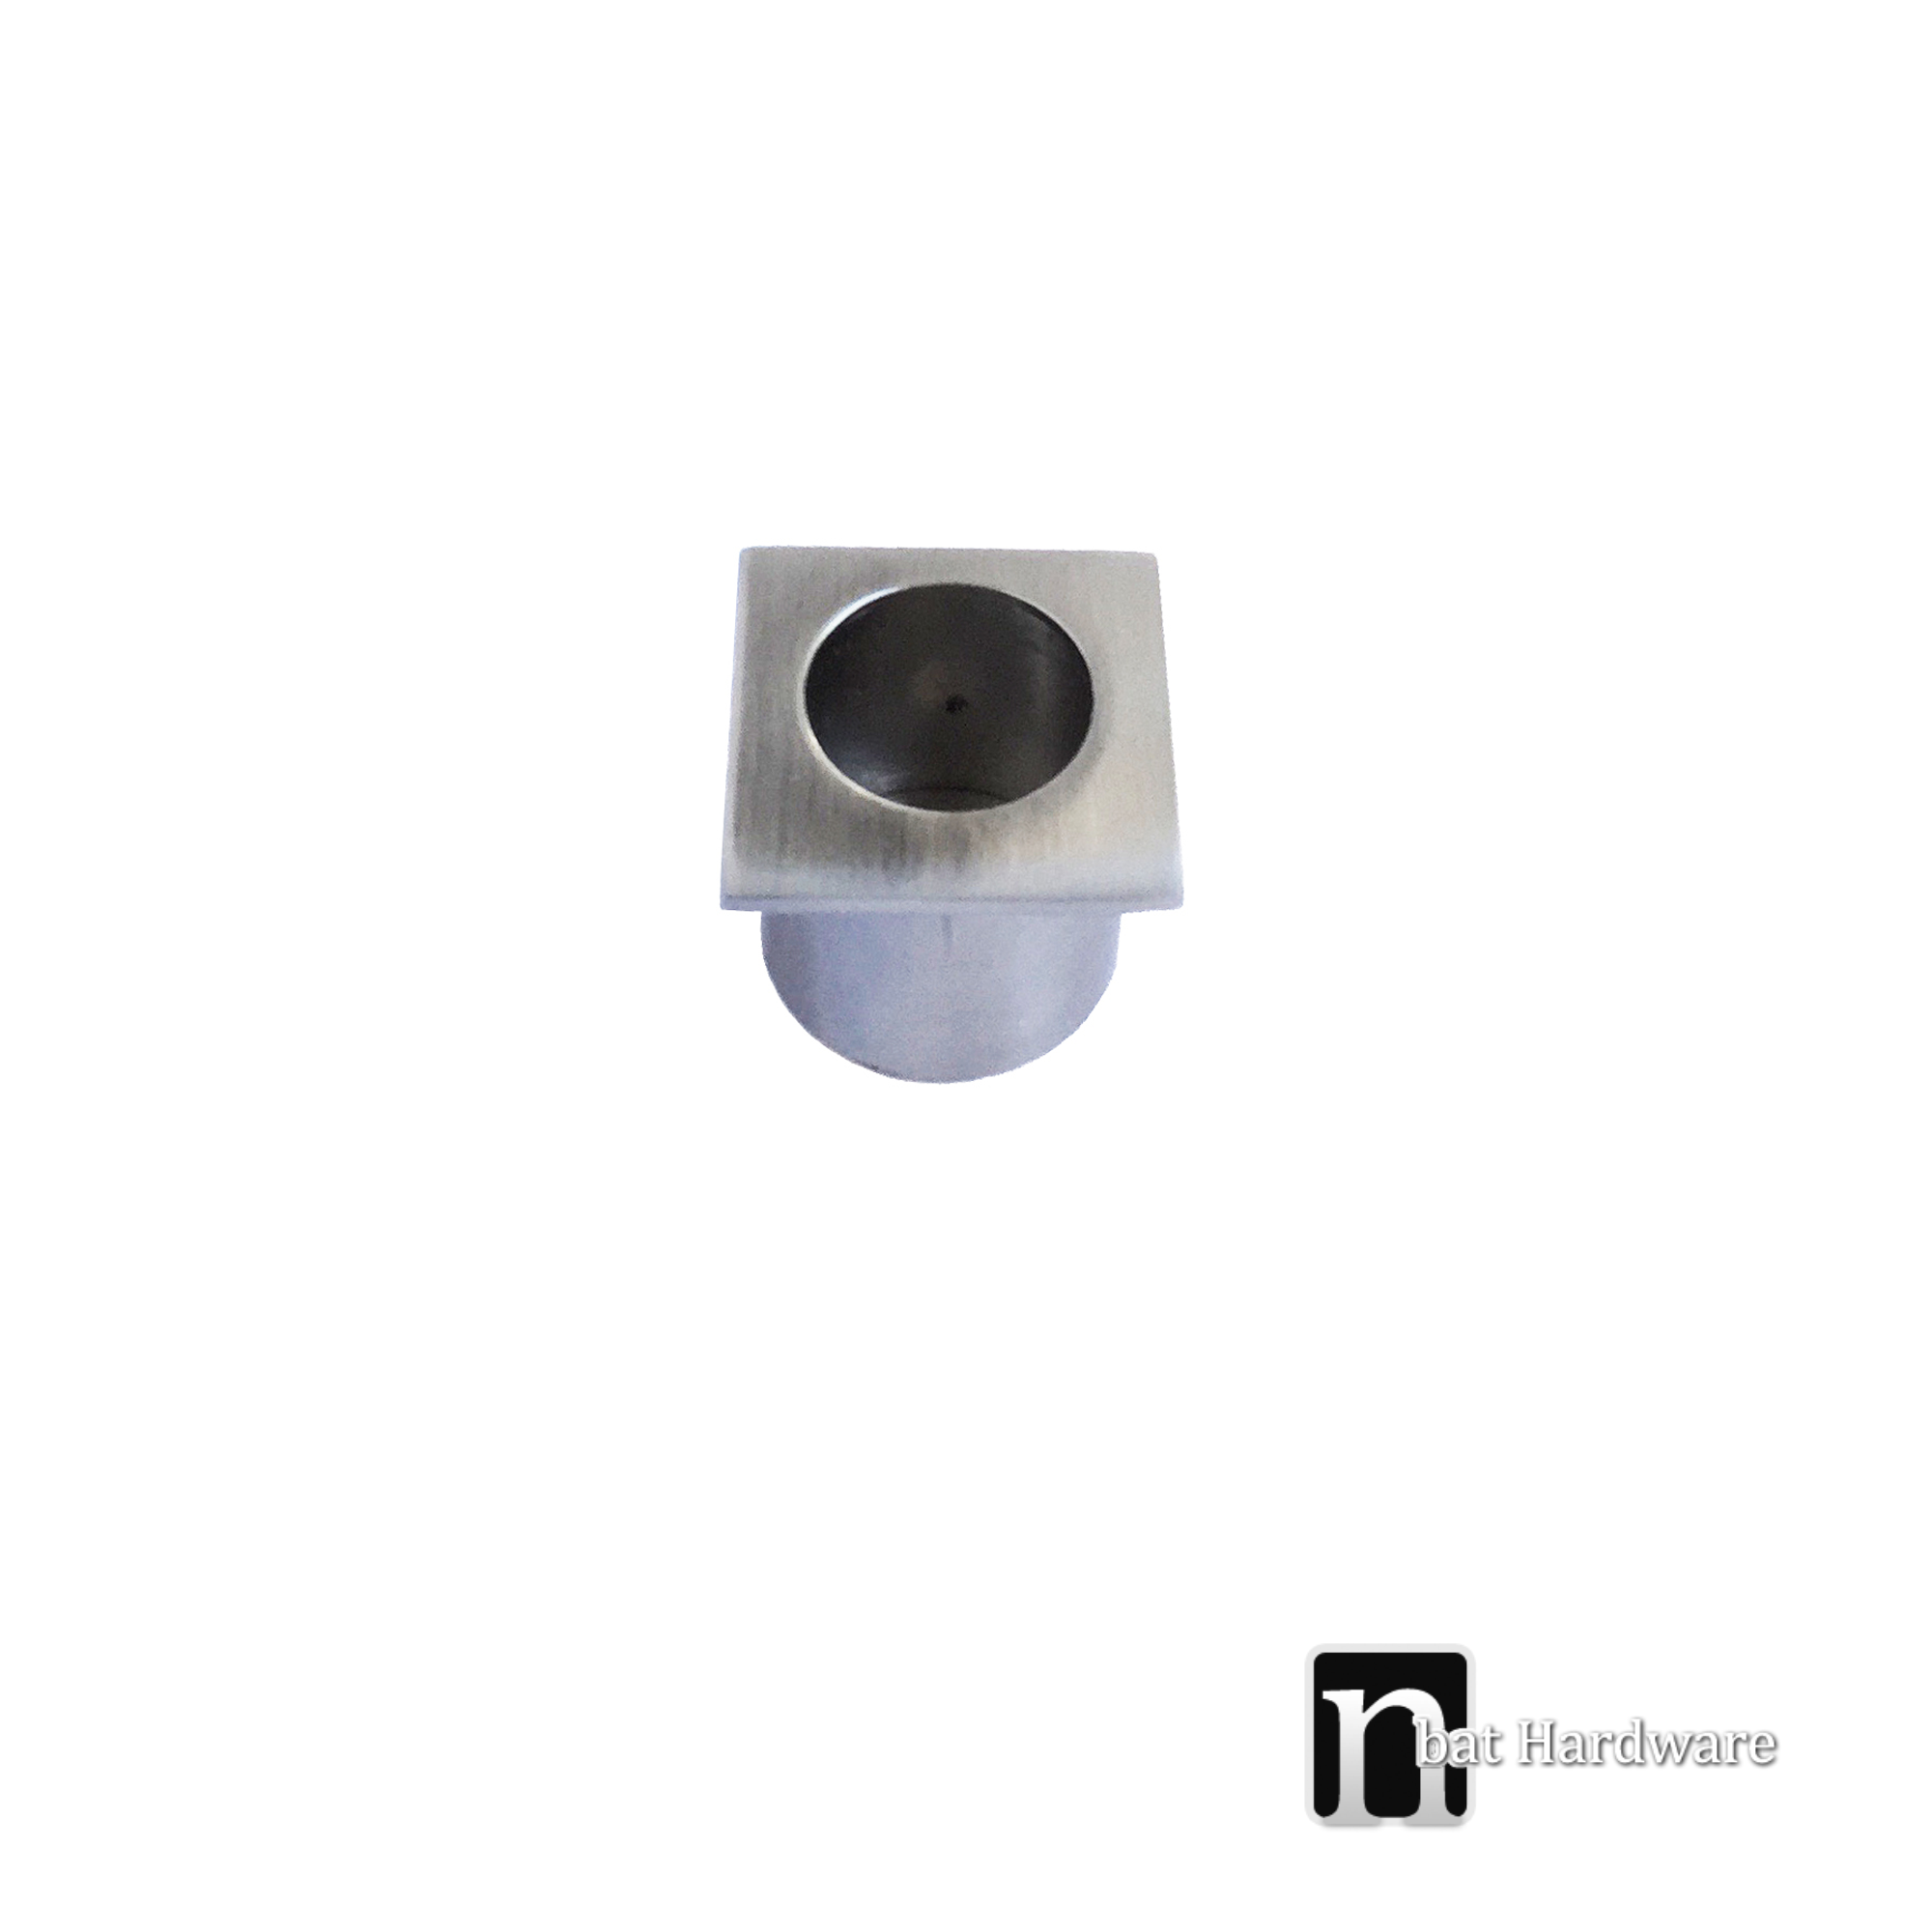 Picture of: Square Facing Sliding Door Finger Pulls Nbat Hardware